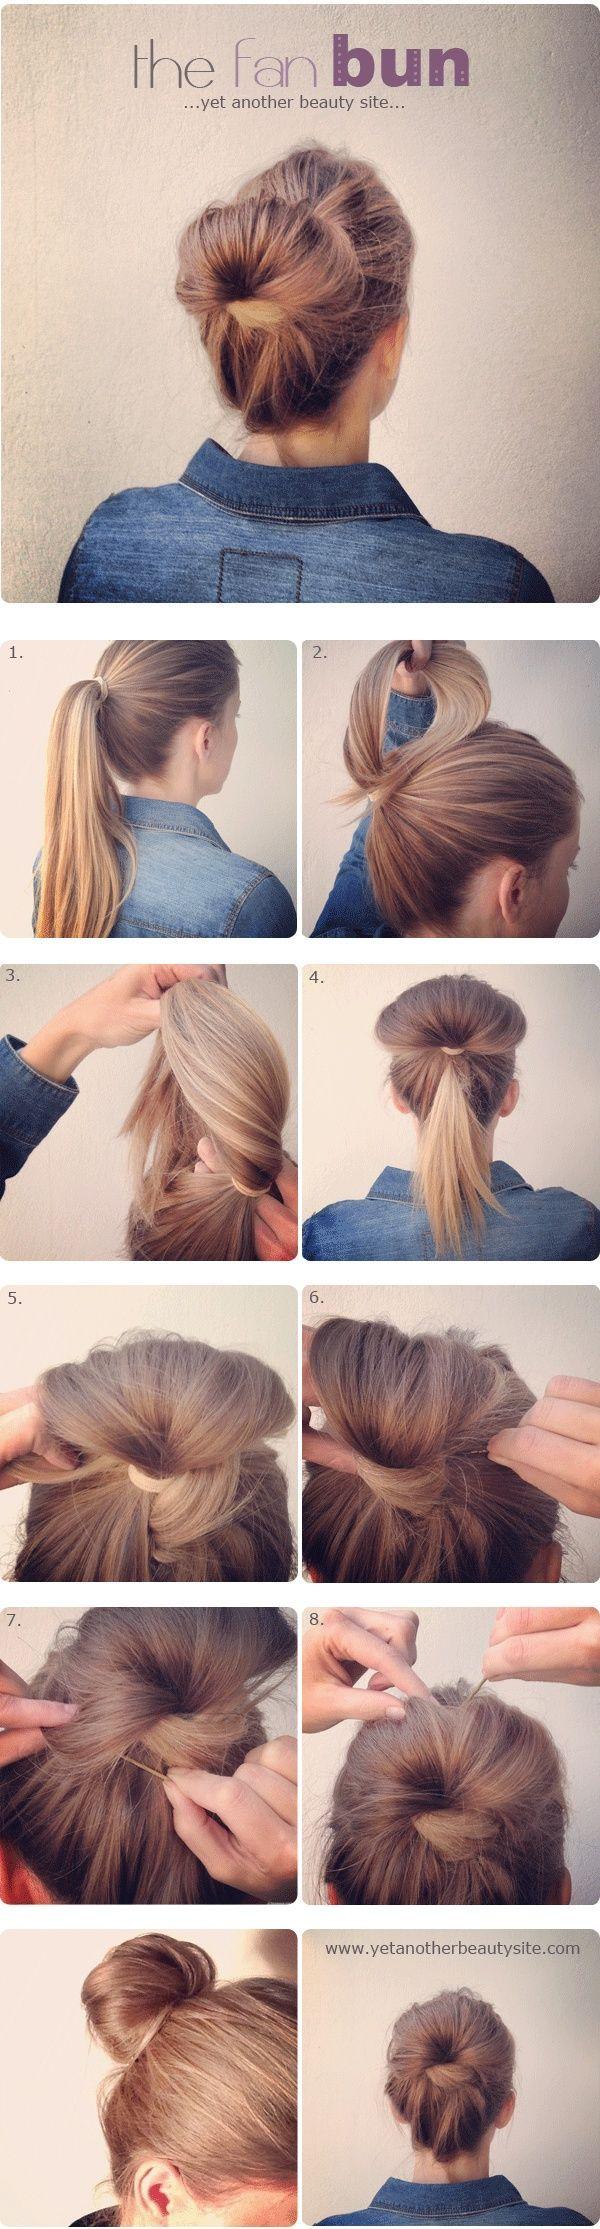 The Fan Bun Hair Style - Style Estate -